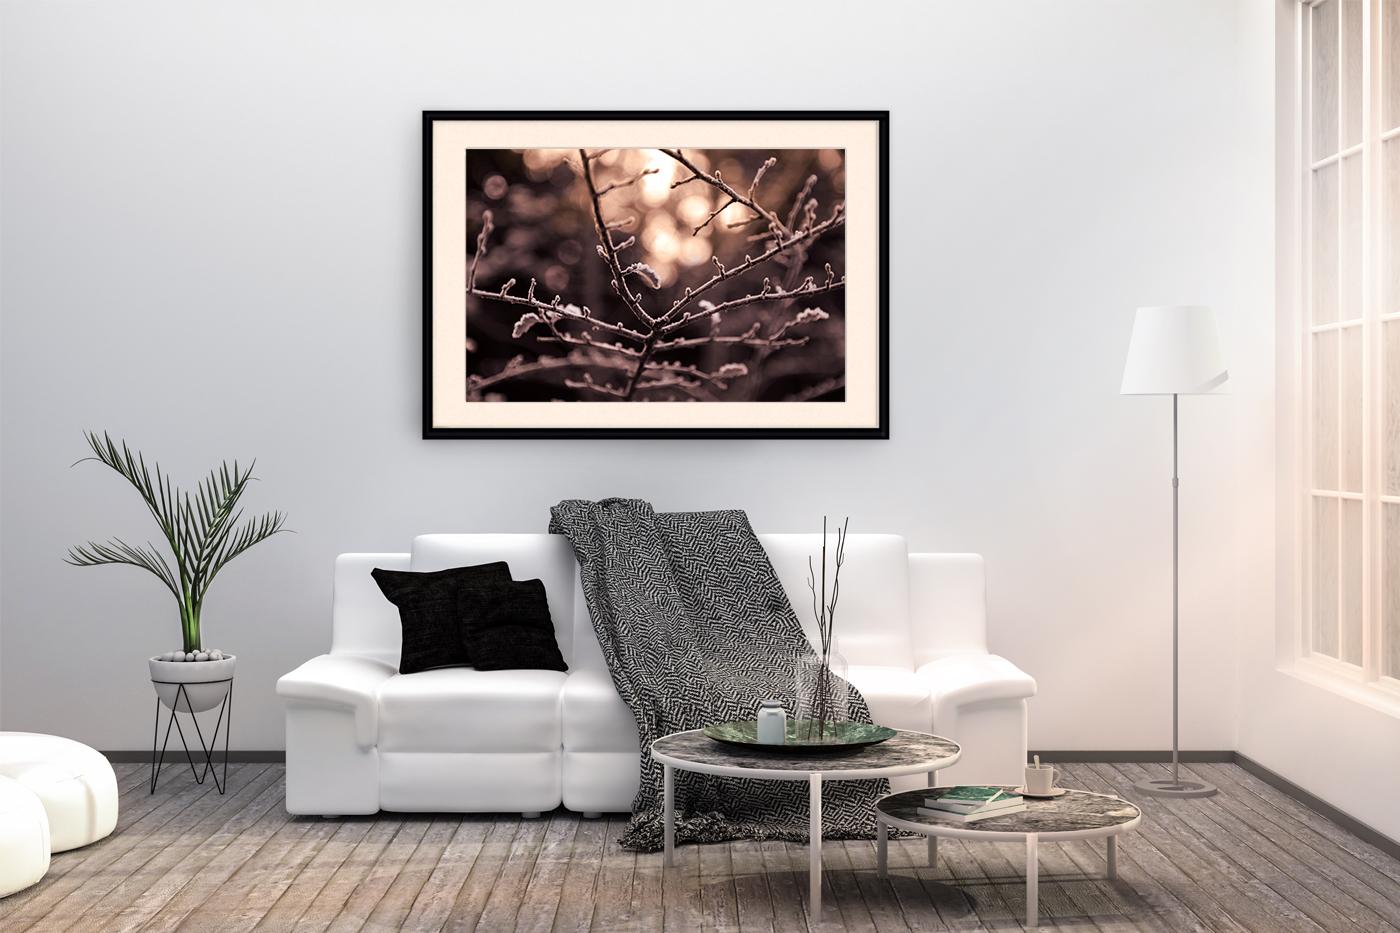 Nature photo, flora photo, twig photo, winter photo example image 4